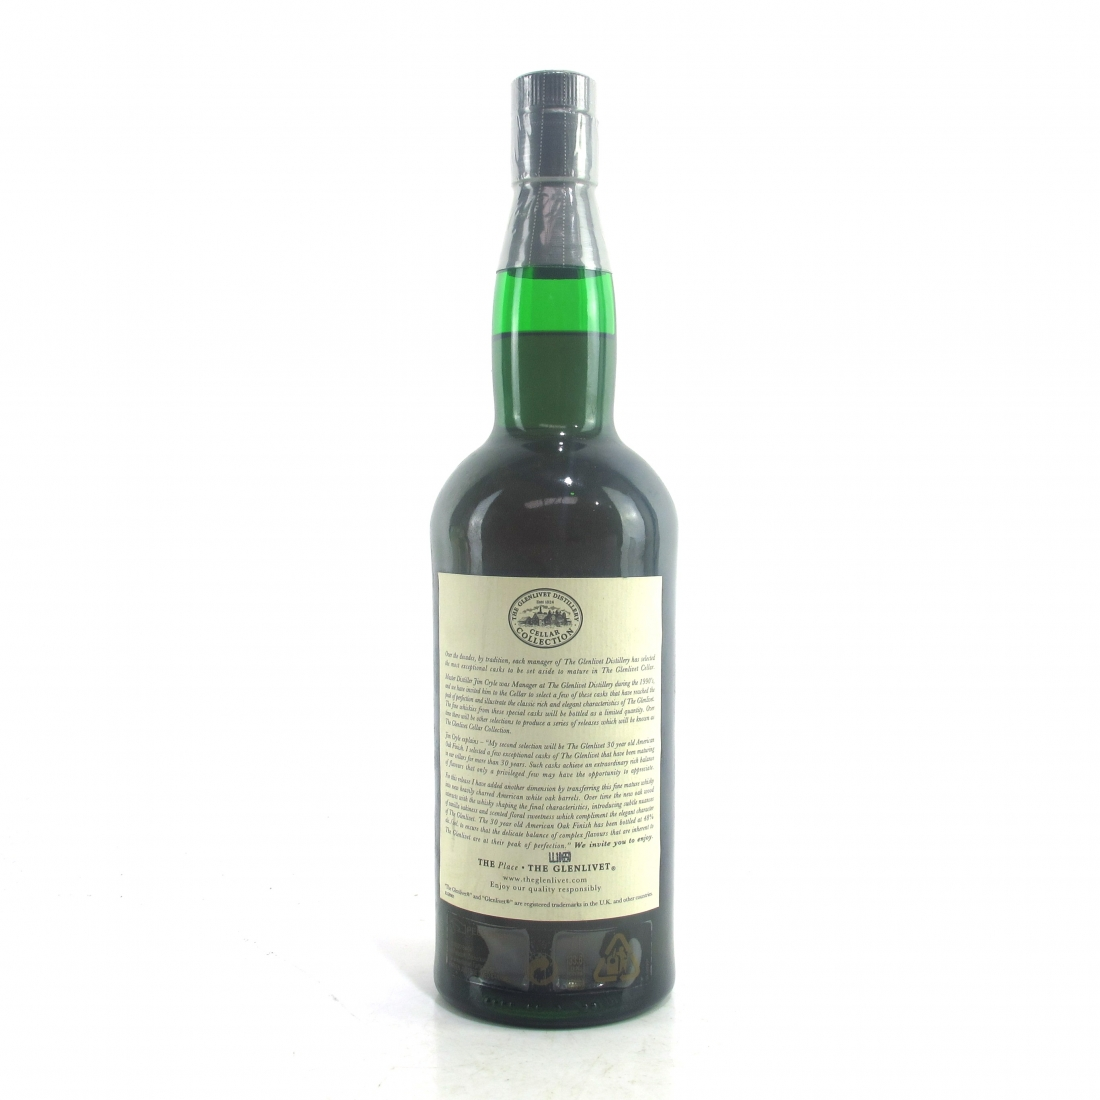 Glenlivet 30 Year Old Cellar Collection / American Oak Finish